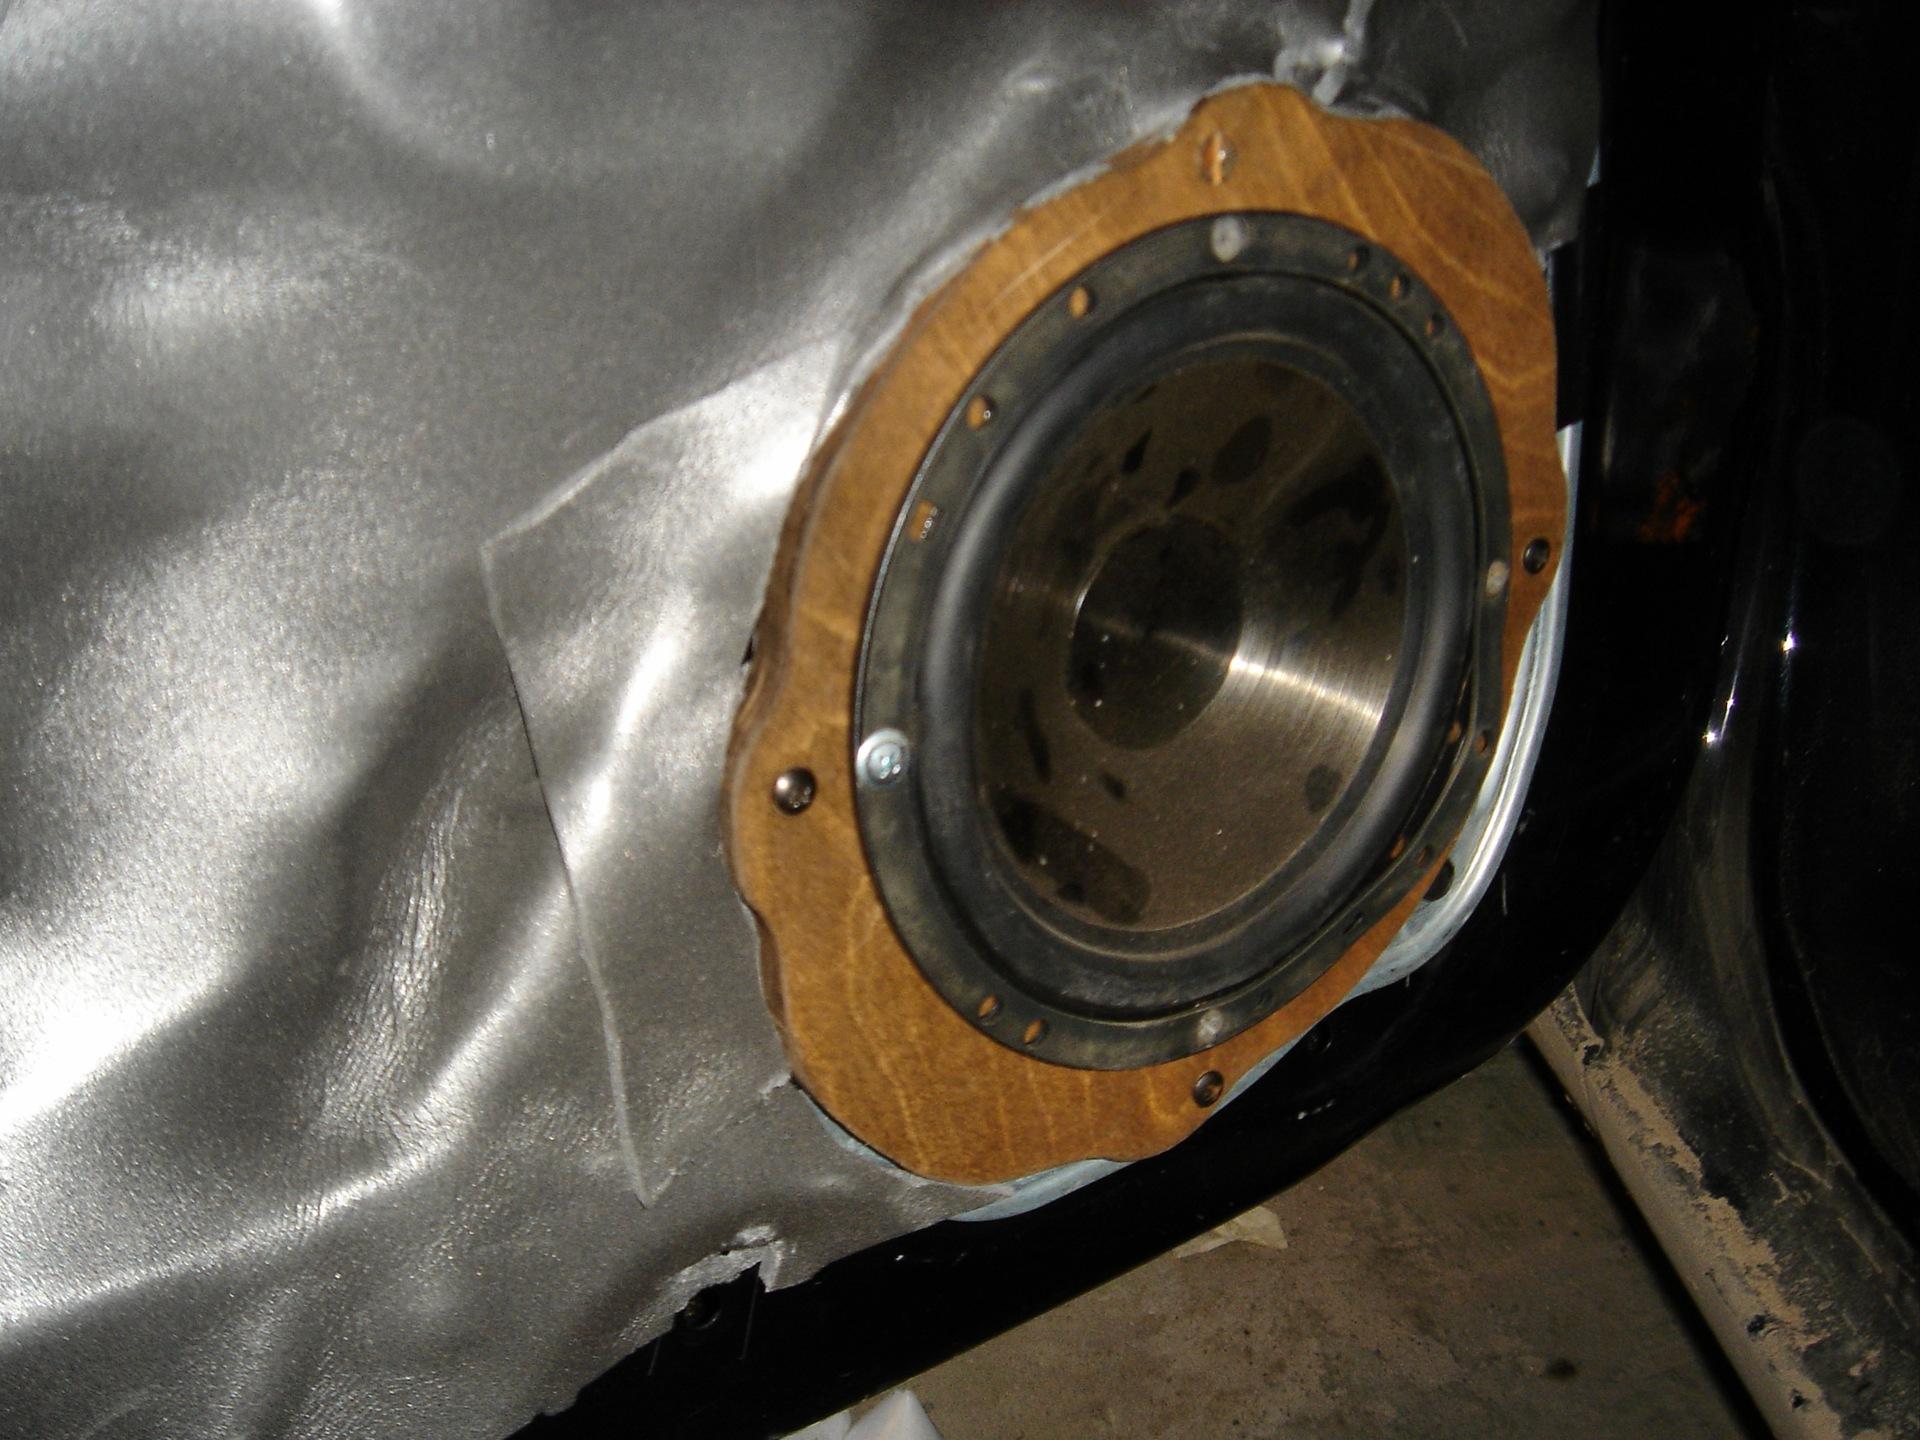 Водоснабжения труб теплоизоляция в для пнд